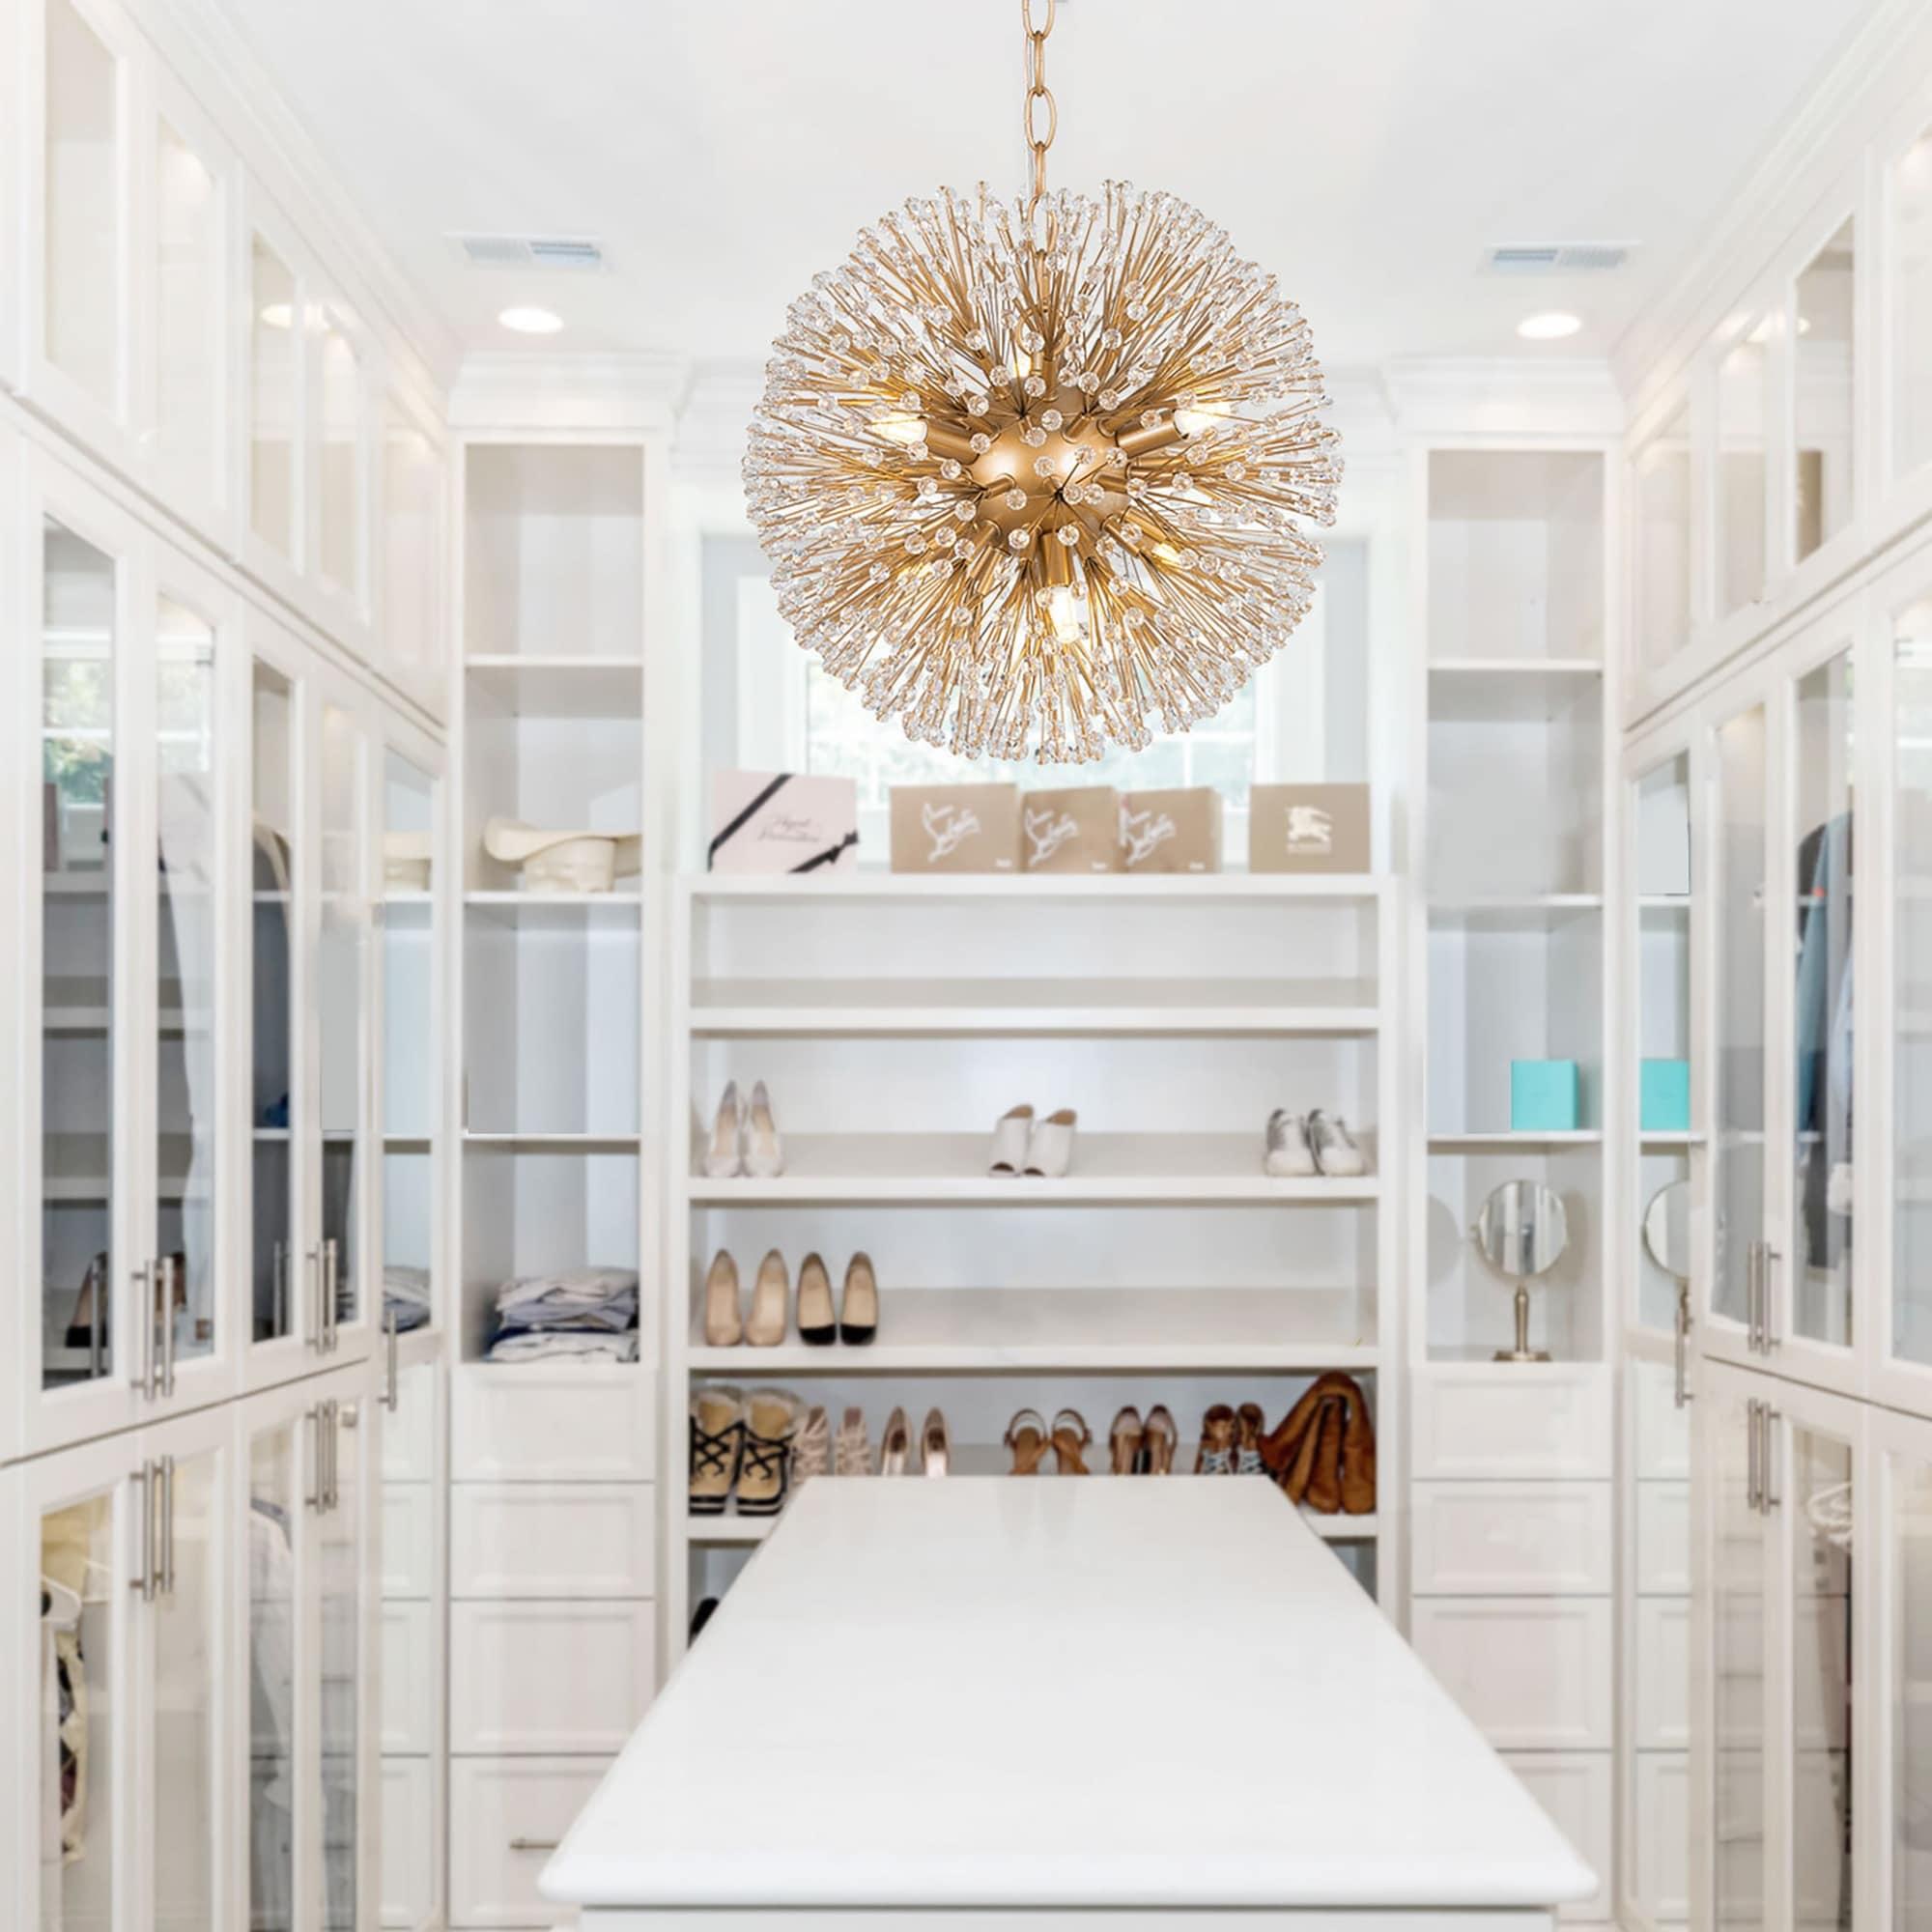 Modern Gold Globe Crystal Dandelion Chandelier 6 Light Ceiling Hanging Pendant Lighting Fixture D14 X H14 Overstock 32969077